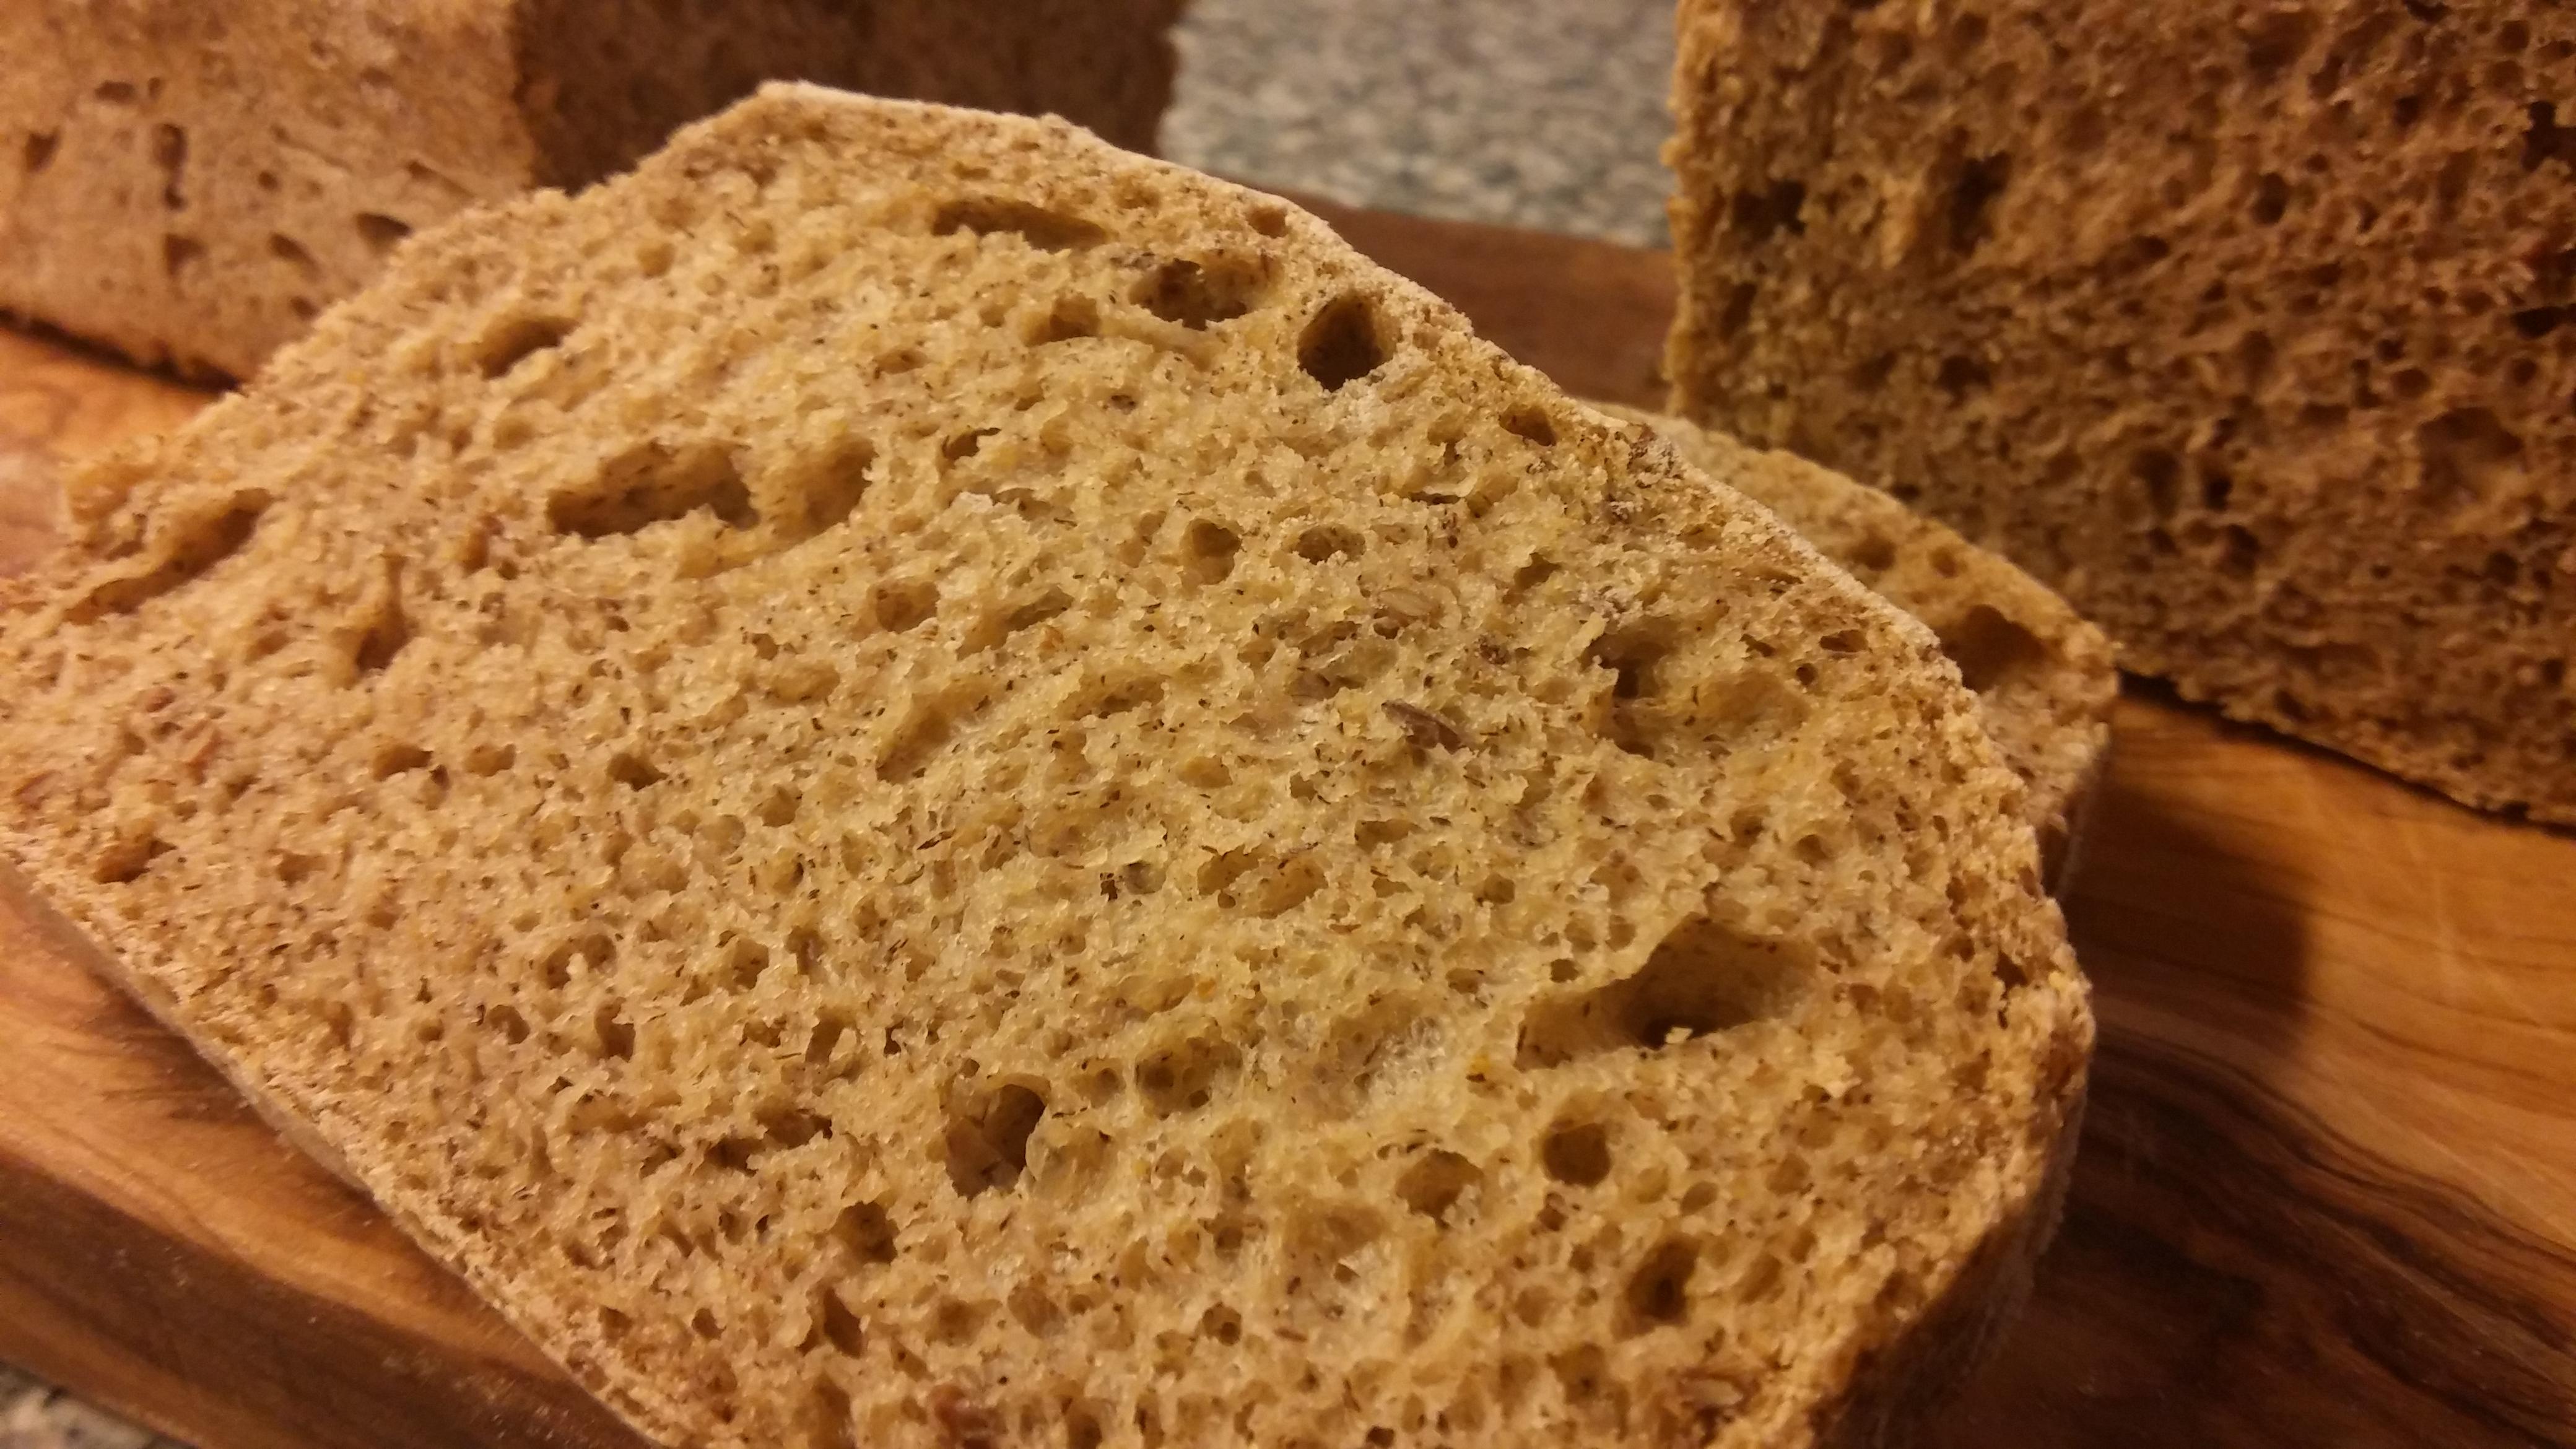 Chleba po upečení